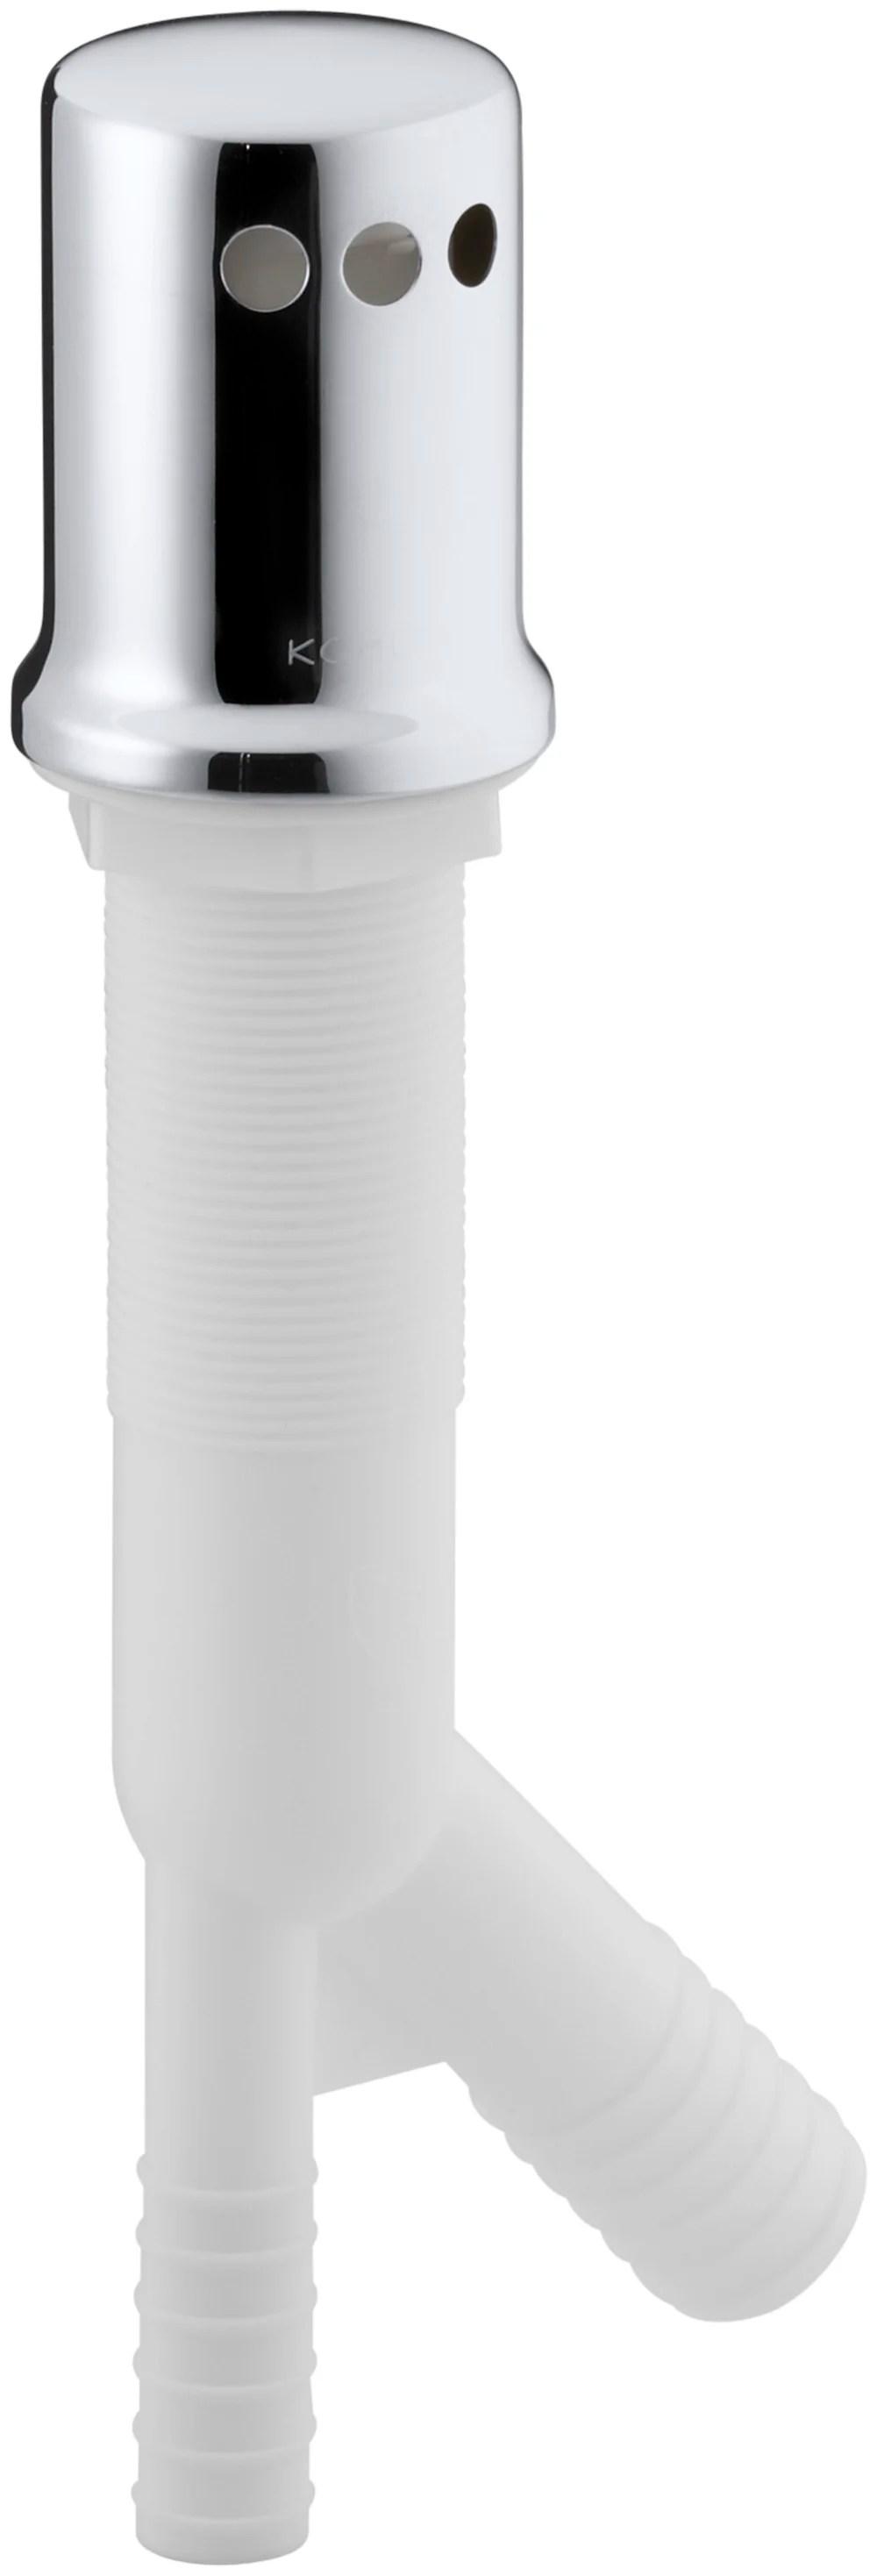 Dishwasher Air Gap Alternatives California : dishwasher, alternatives, california, Dishwasher, You'll, Wayfair